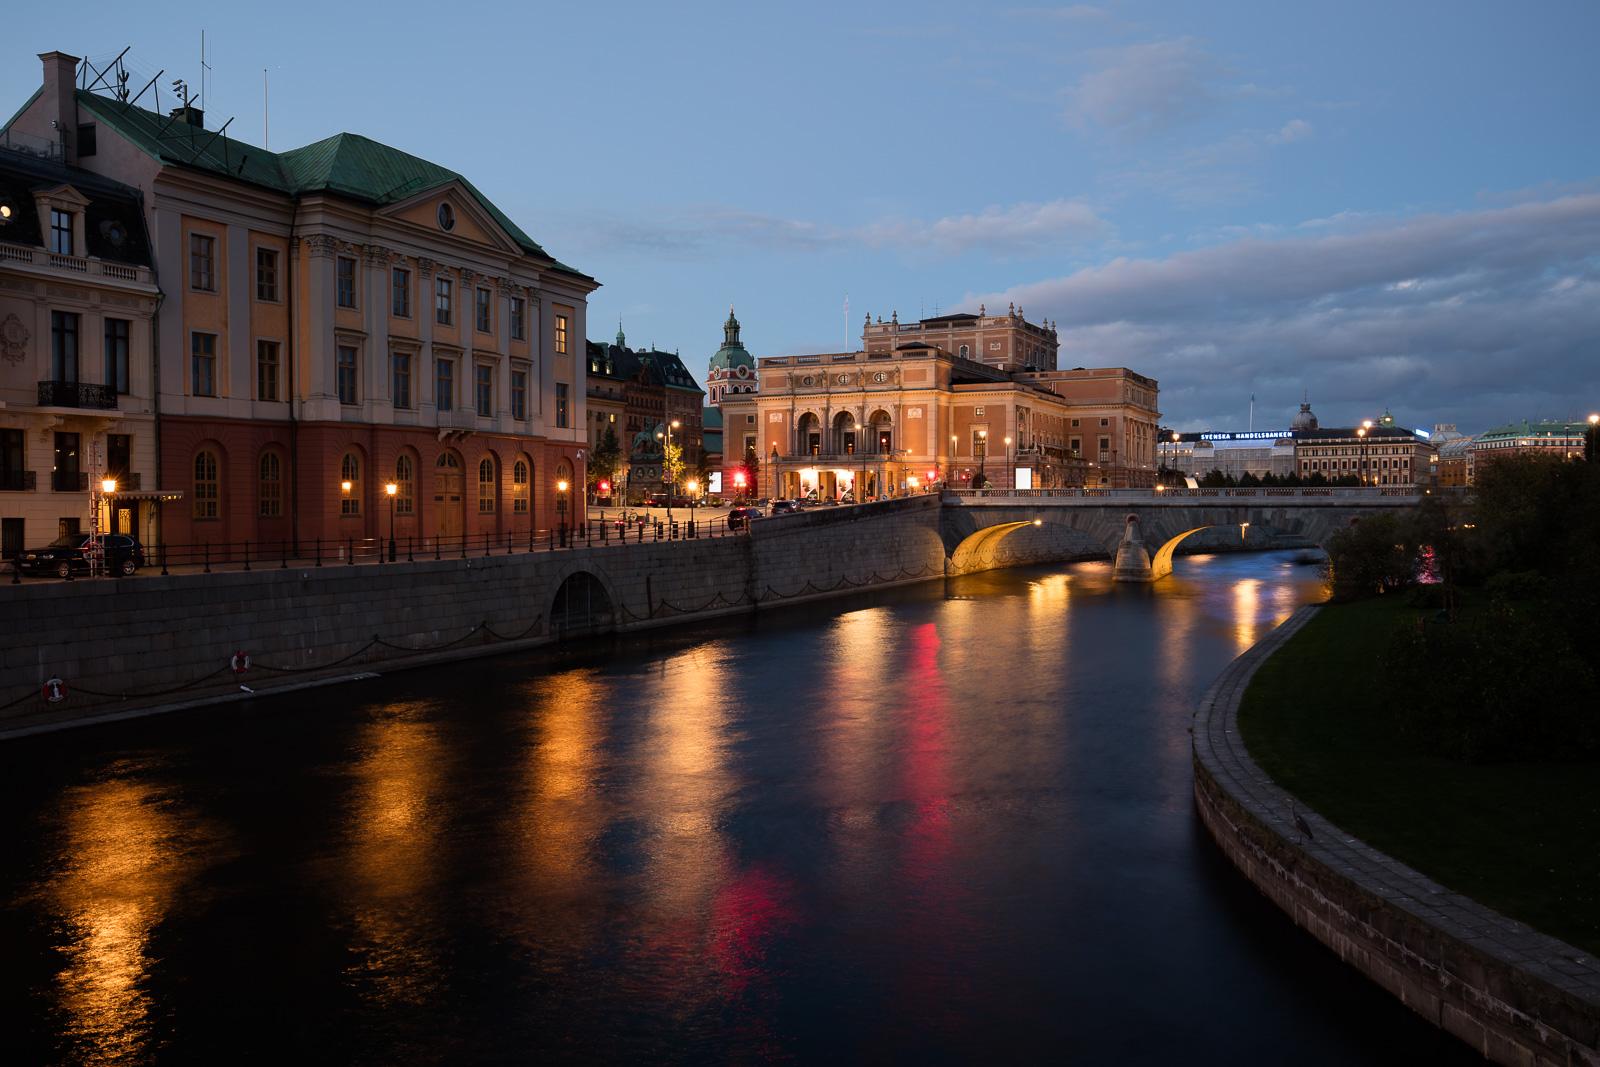 161002-stockholm-457.jpg